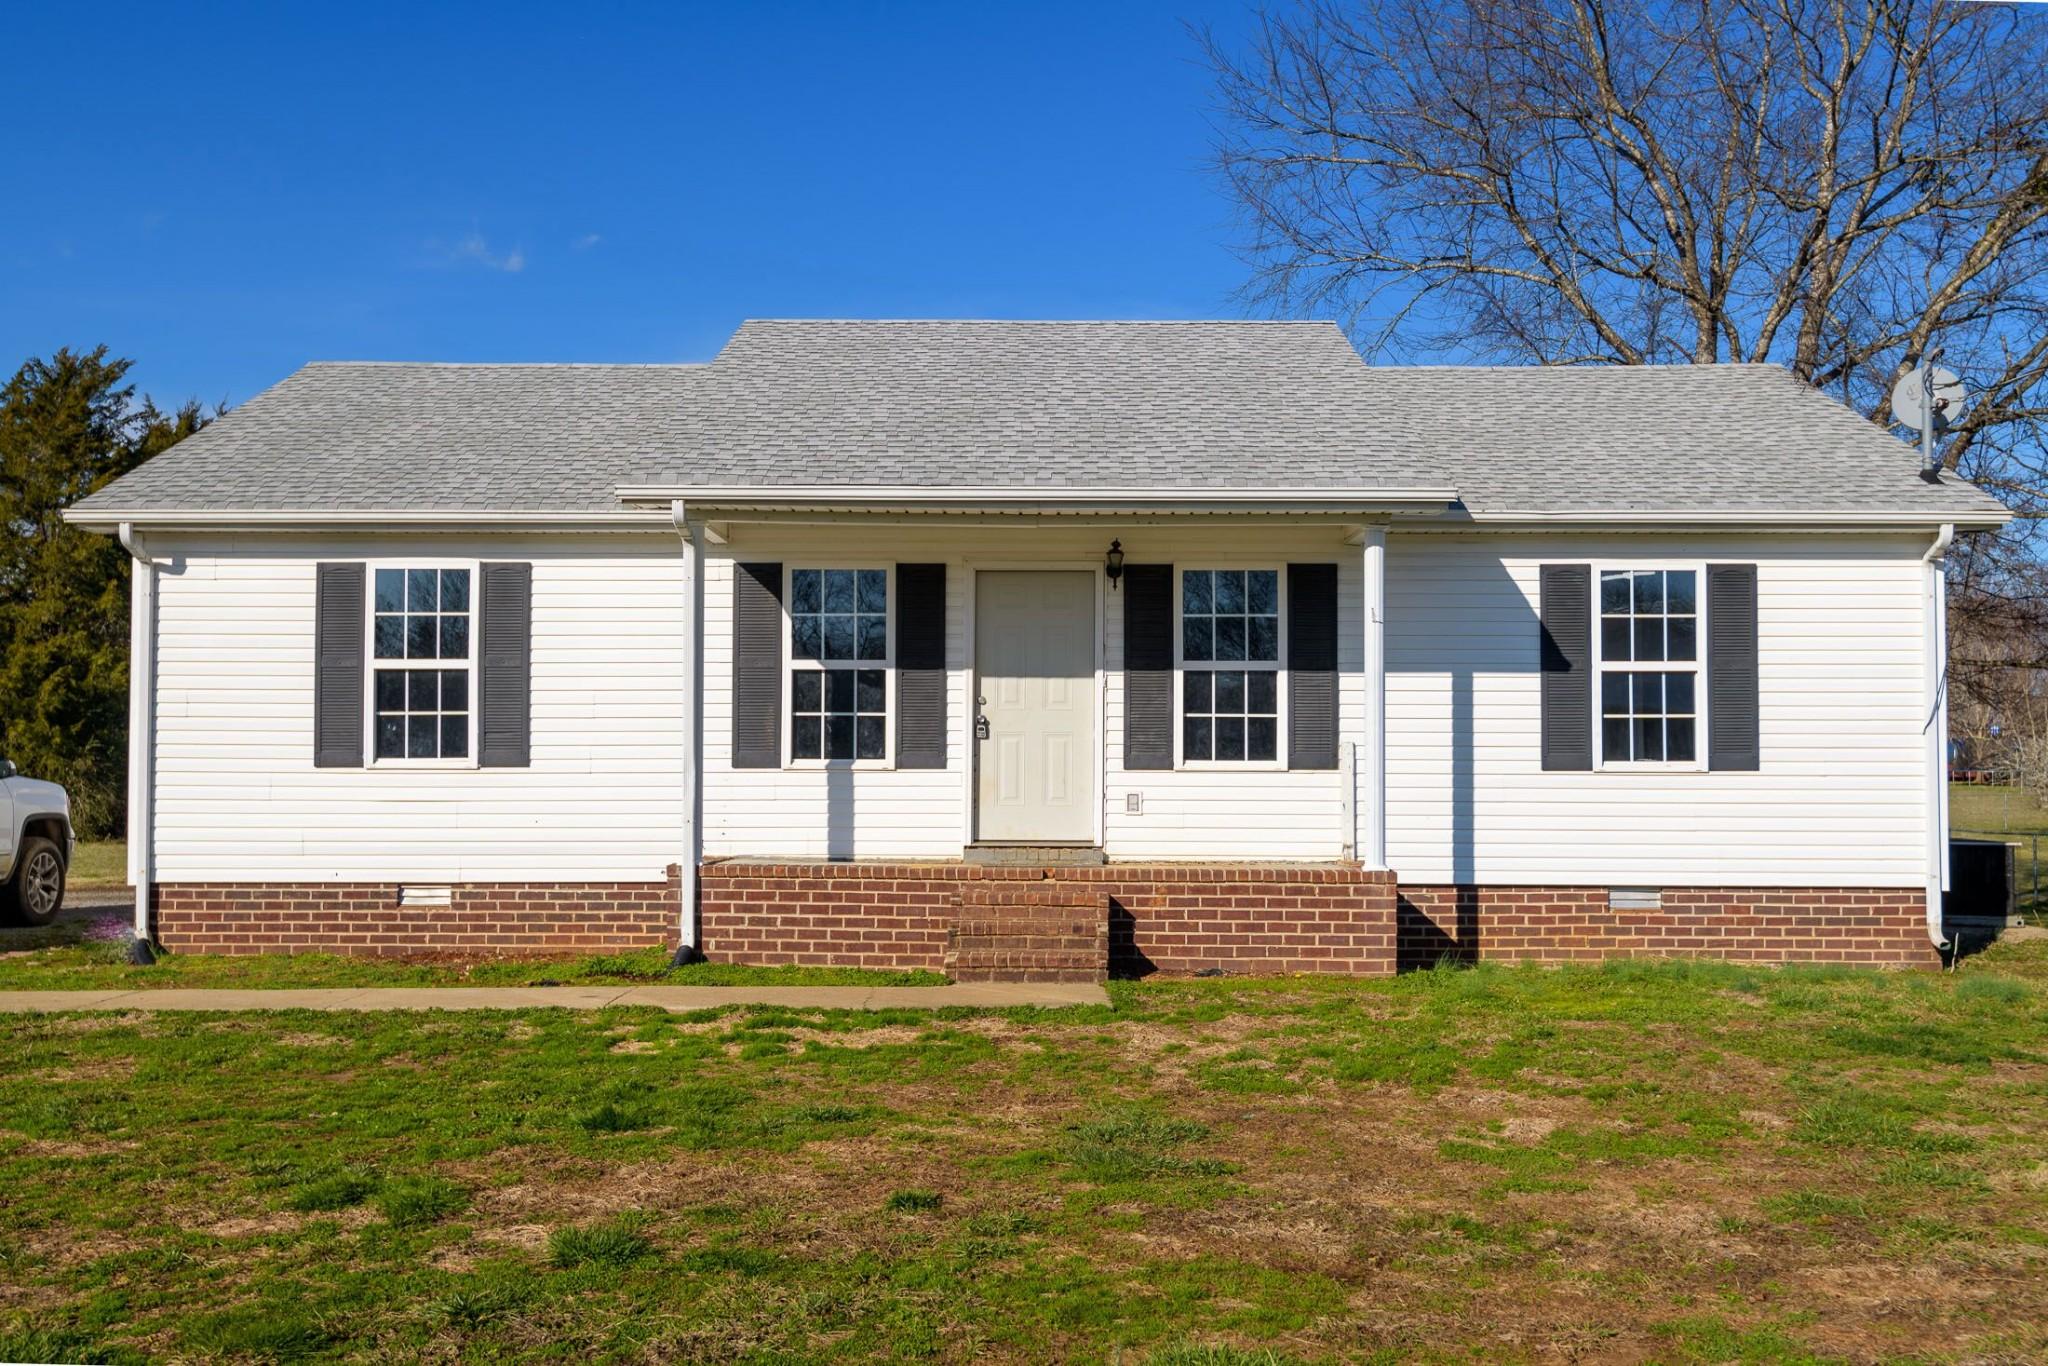 106 Bradley Dr, Unionville, TN 37180 - Unionville, TN real estate listing